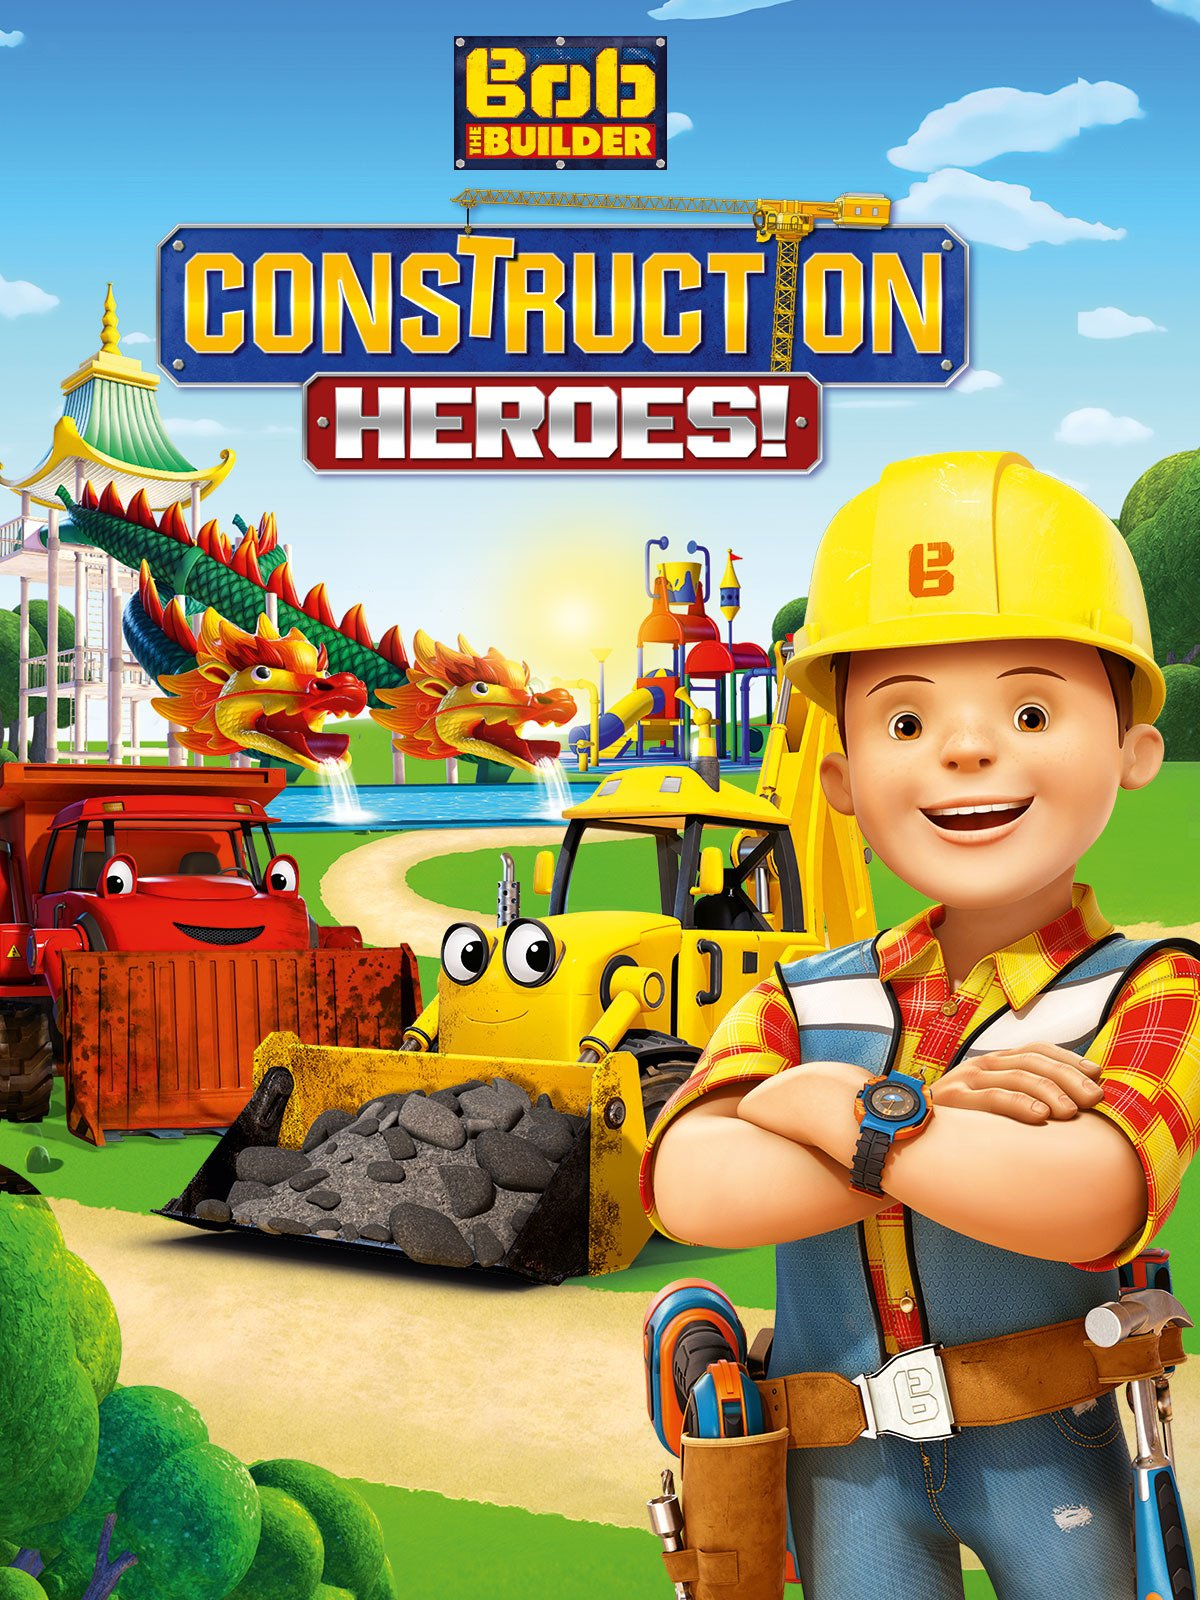 Bob the builder live online dvd rental - Bob The Builder Construction Heroes